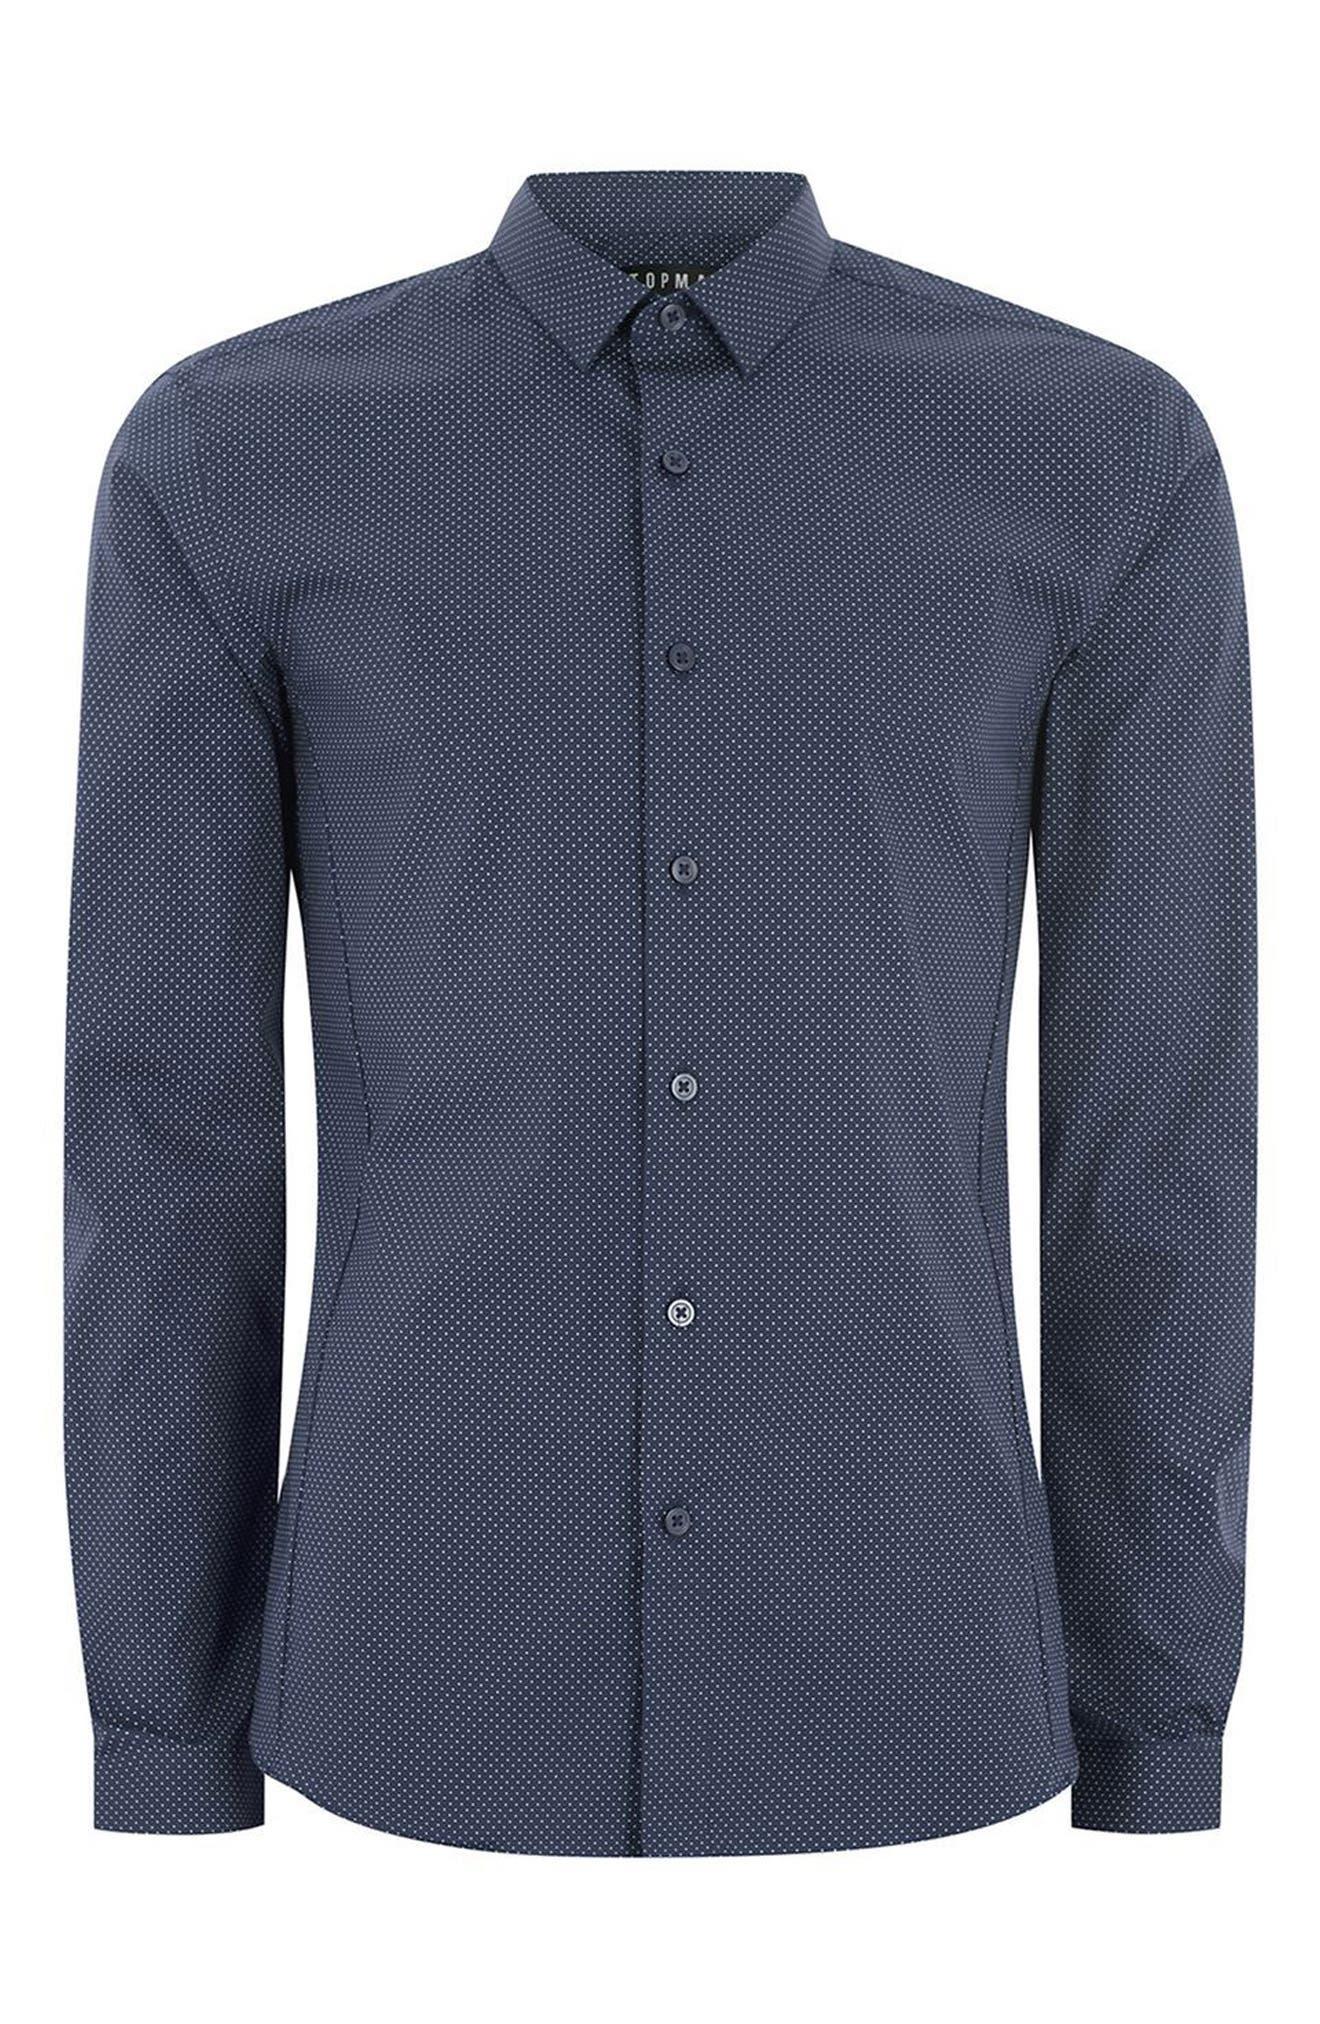 Alternate Image 4  - Topman Polka Dot Stretch Smart Shirt